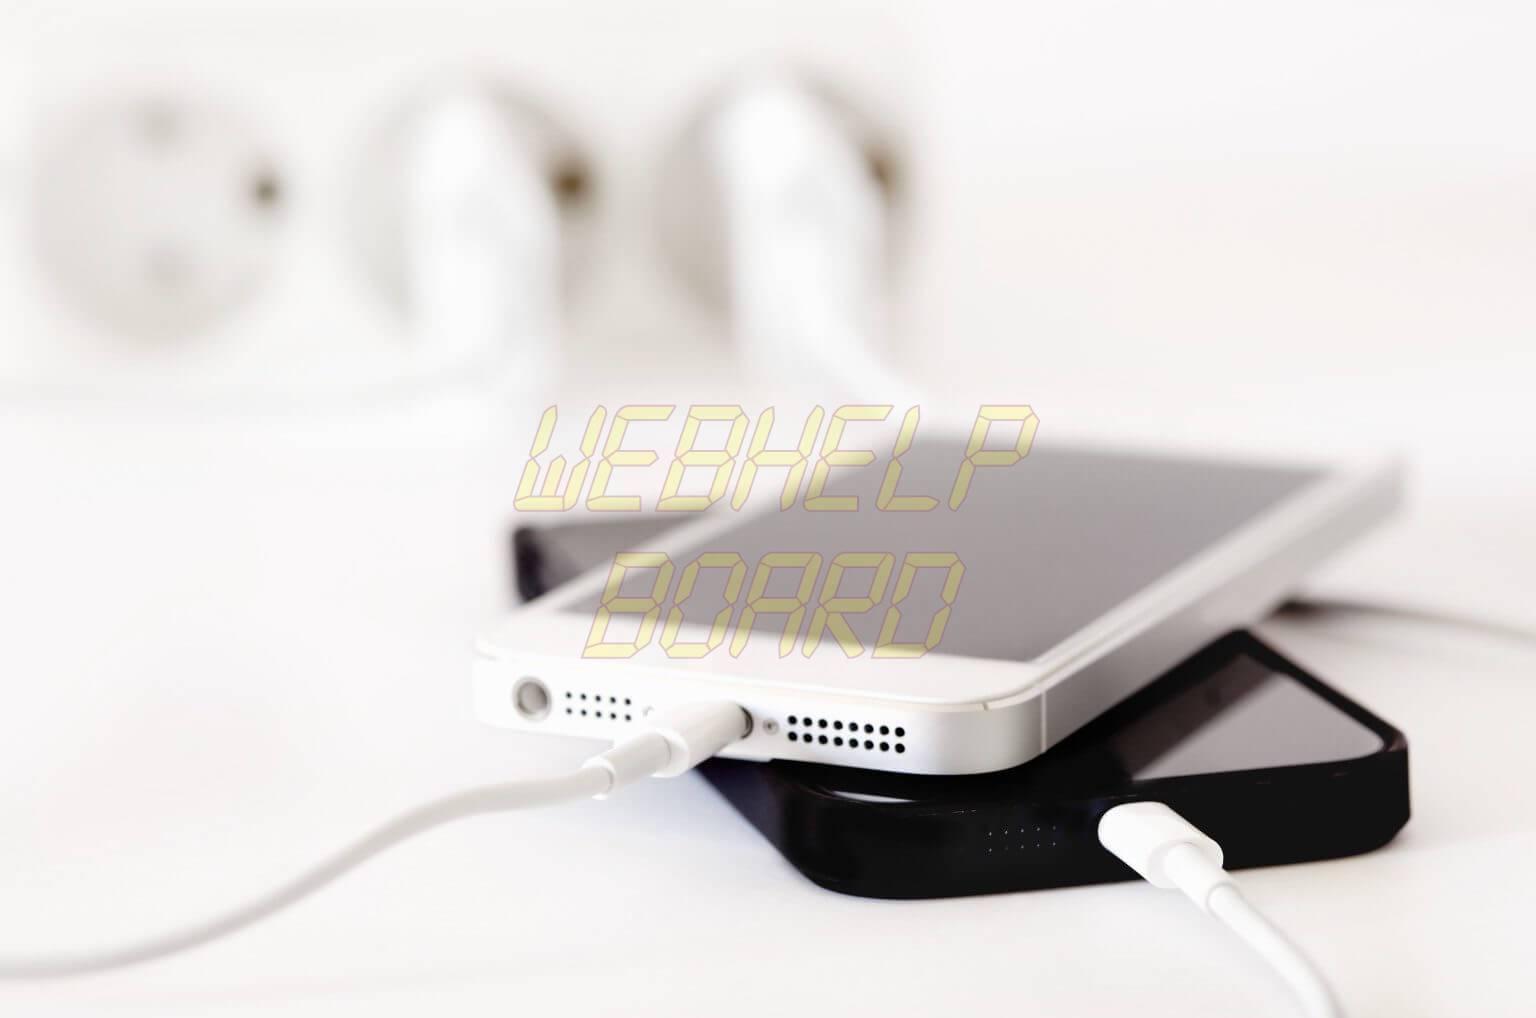 o IPHONE CHARGING facebook - Dica: Como carregar a bateria do seu iPhone mais rápido